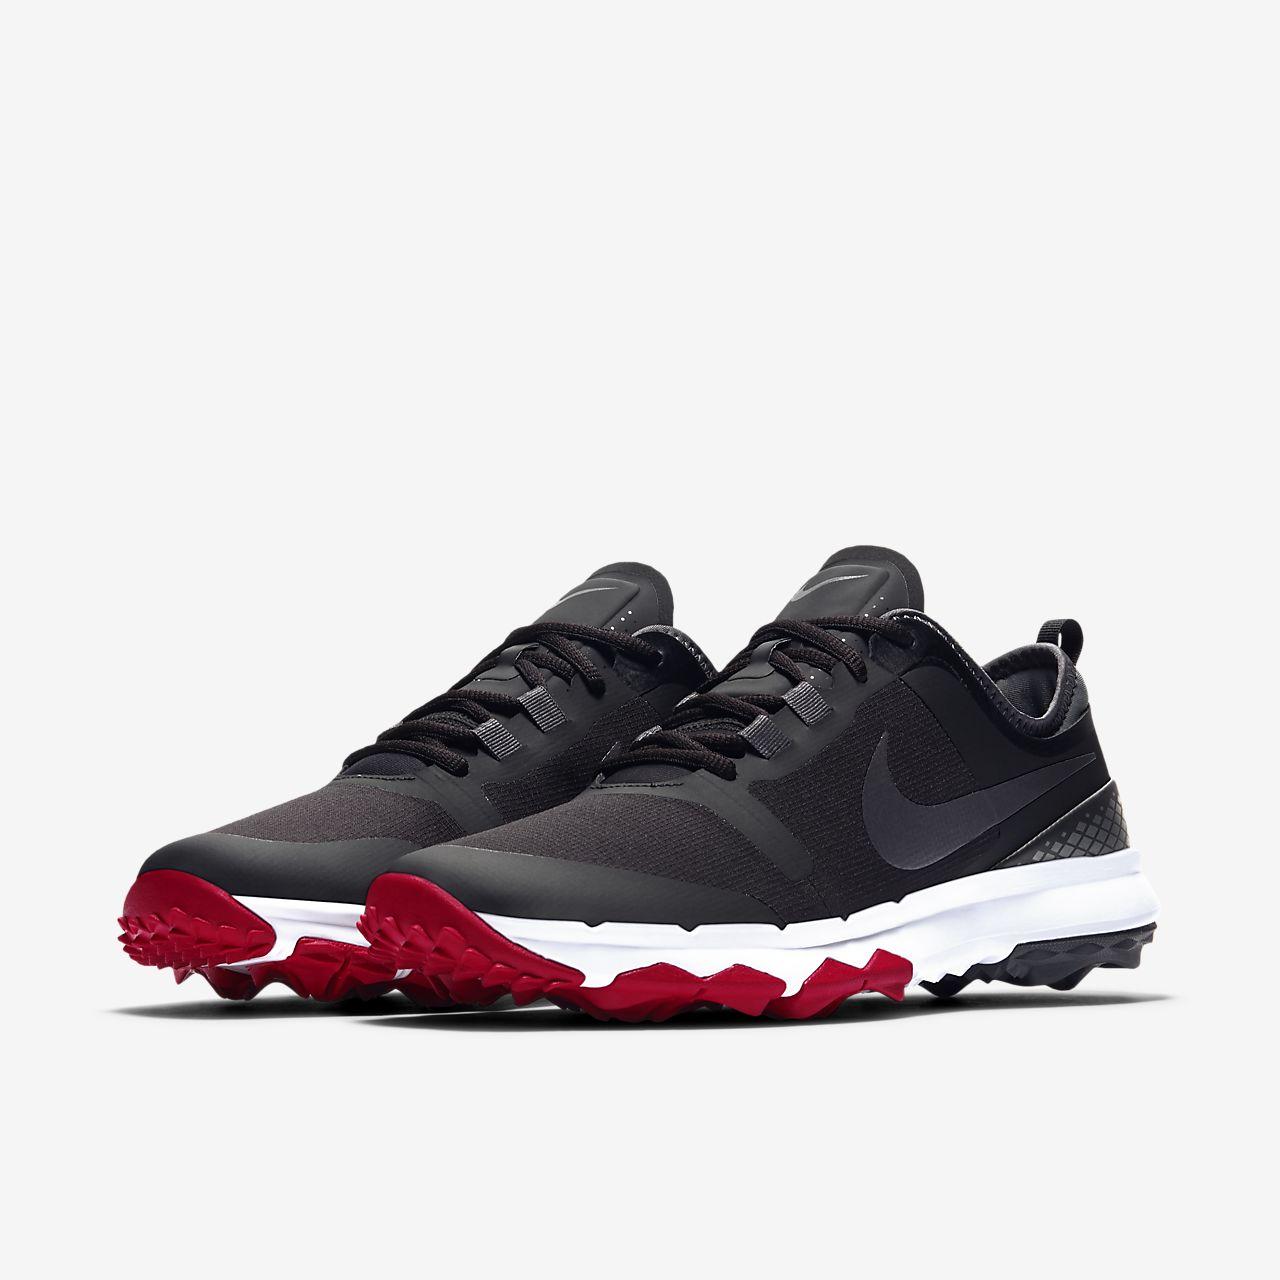 scarpe da golf nike uomo